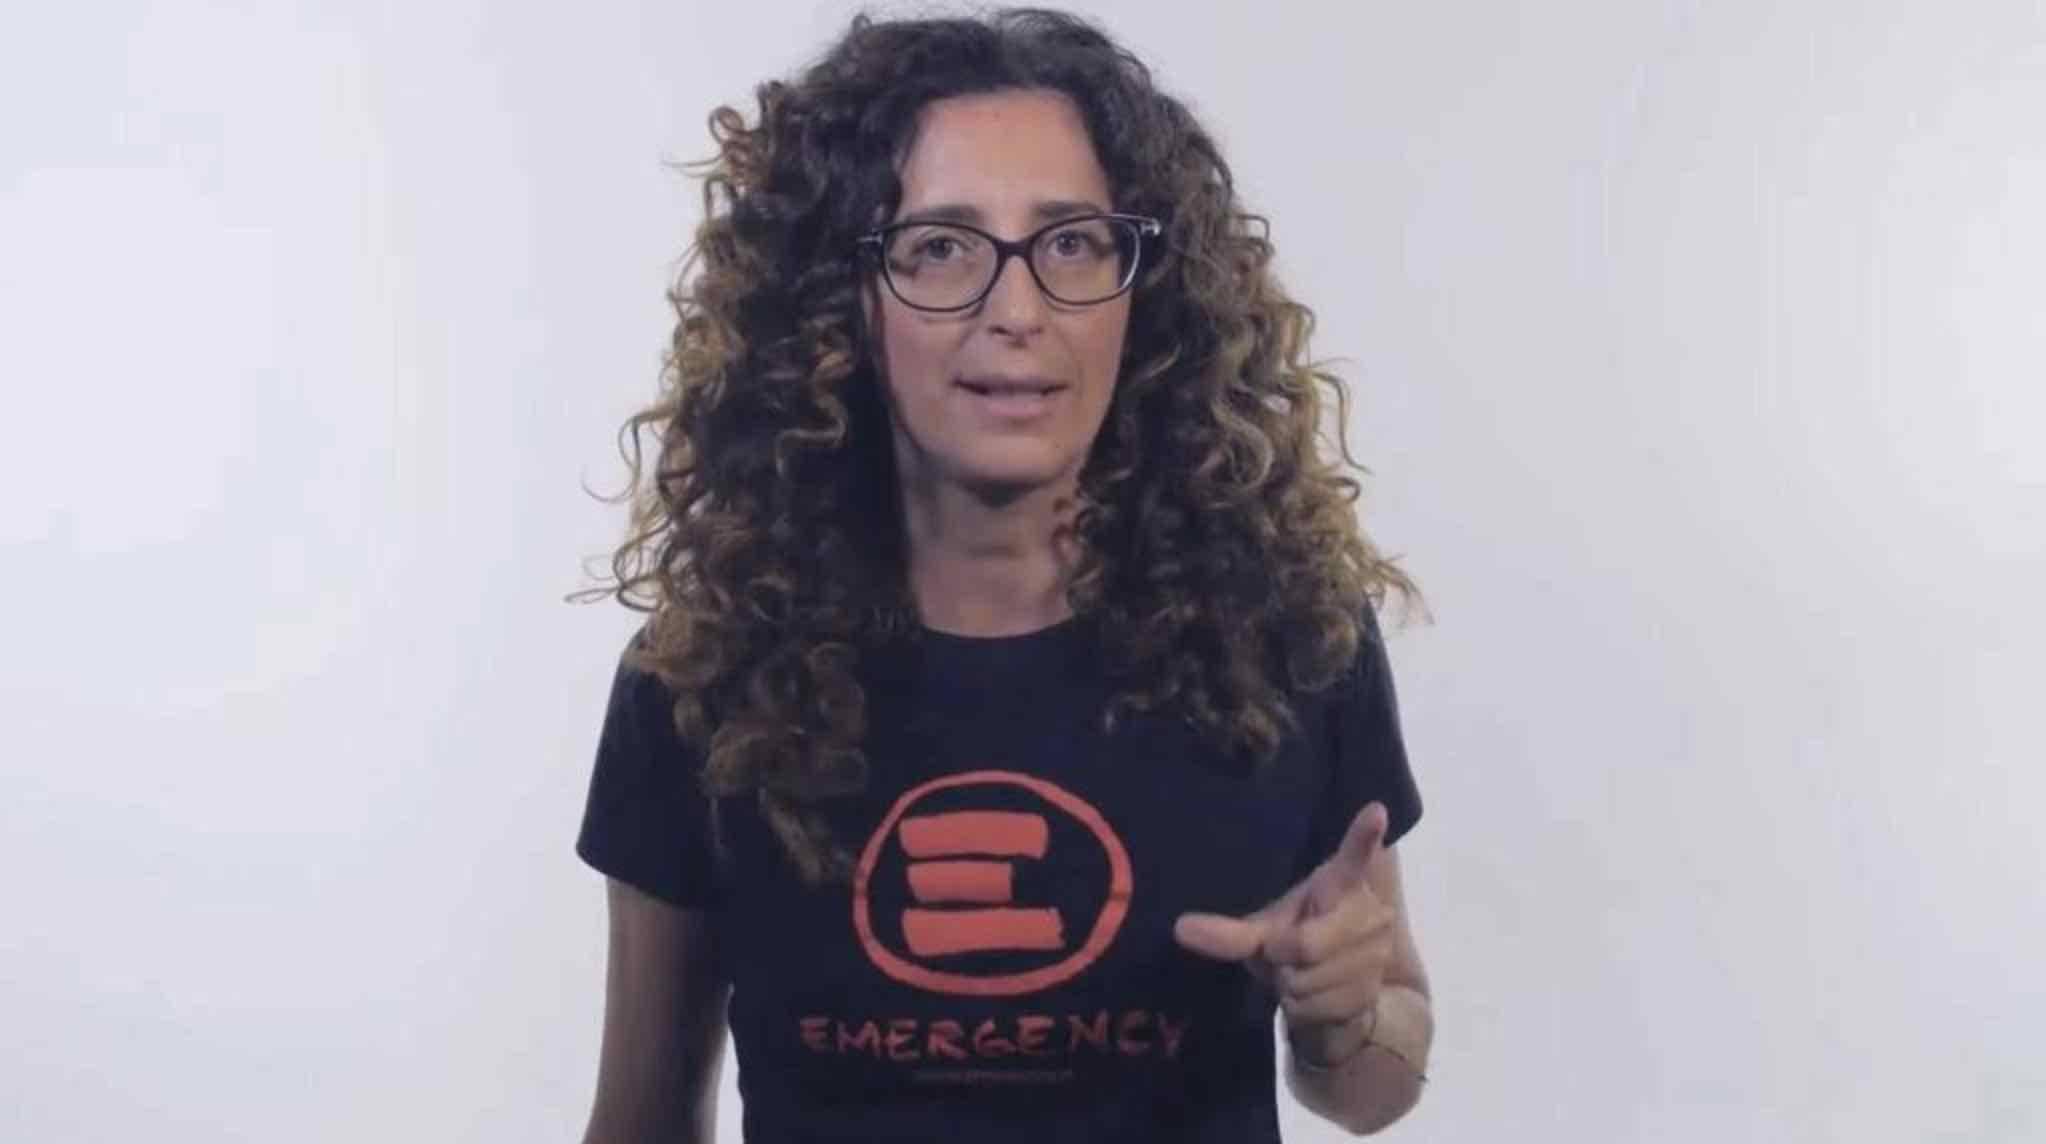 Teresa Mannino migranti